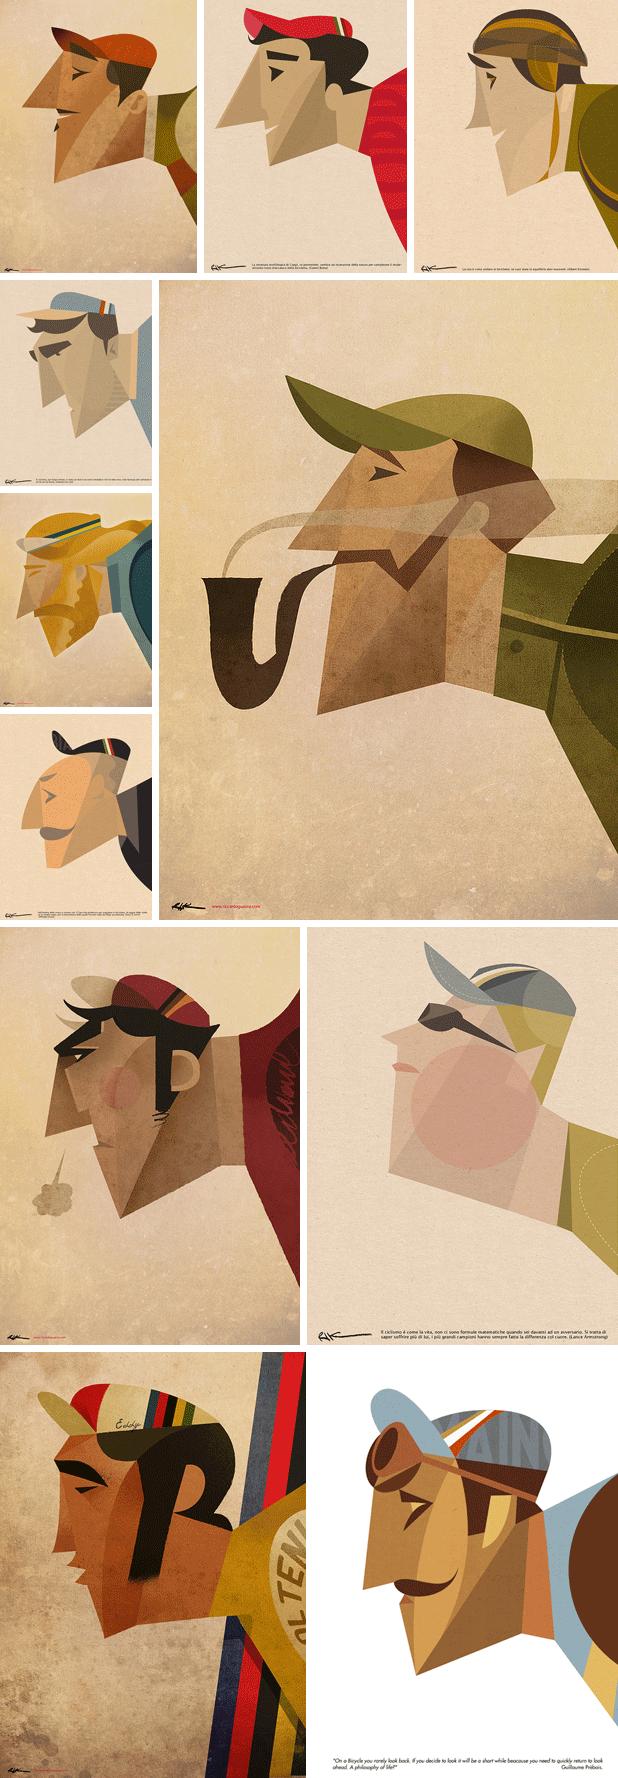 Dream team cyclist illustrations by Riccardo Guasco  #poster #flat #illustration http://www.artcoursework.com/illustration.html